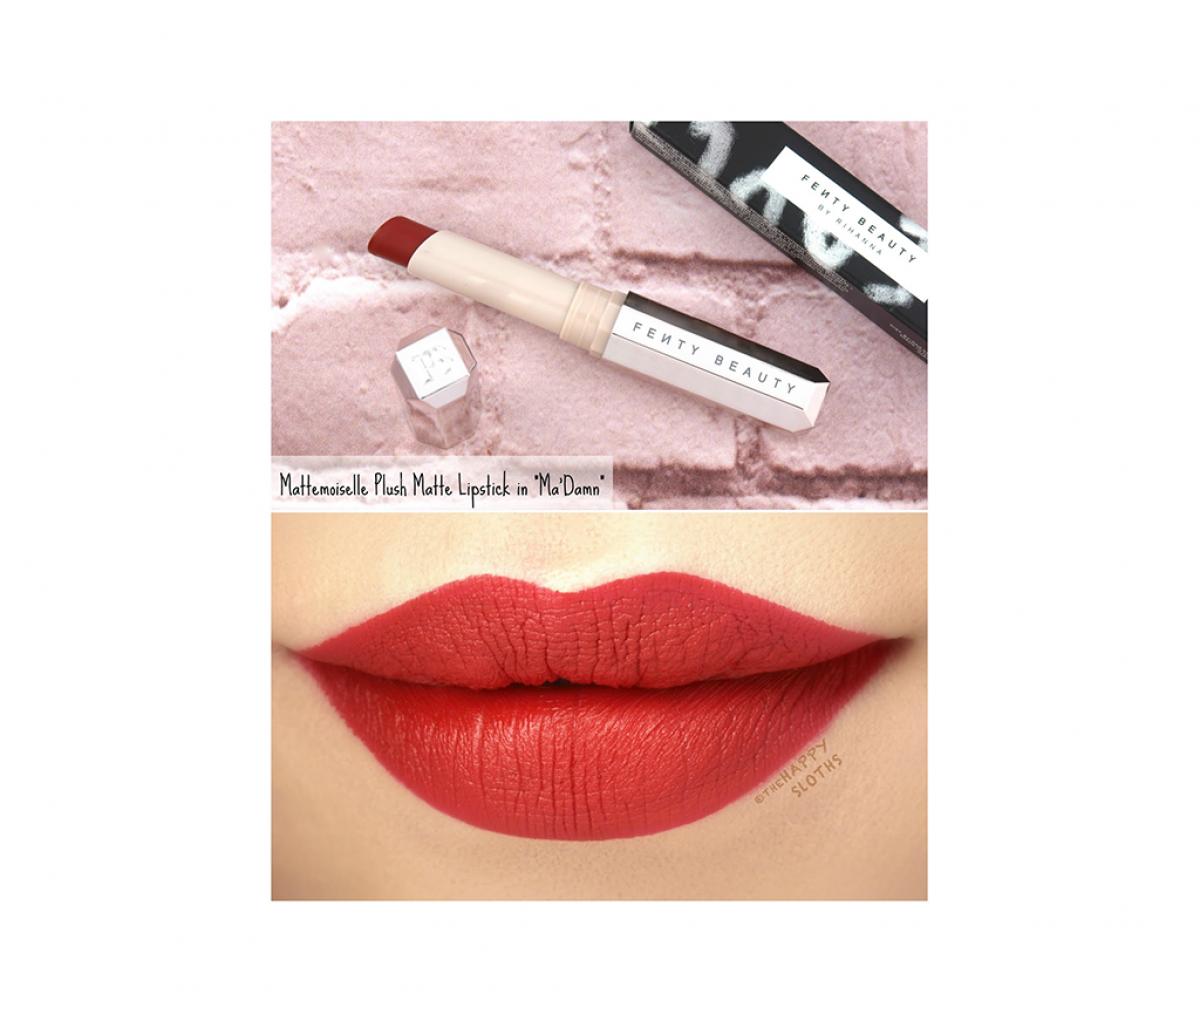 Fenty Beauty Mattemoiselle Plush Matte Lipstick MADAMN